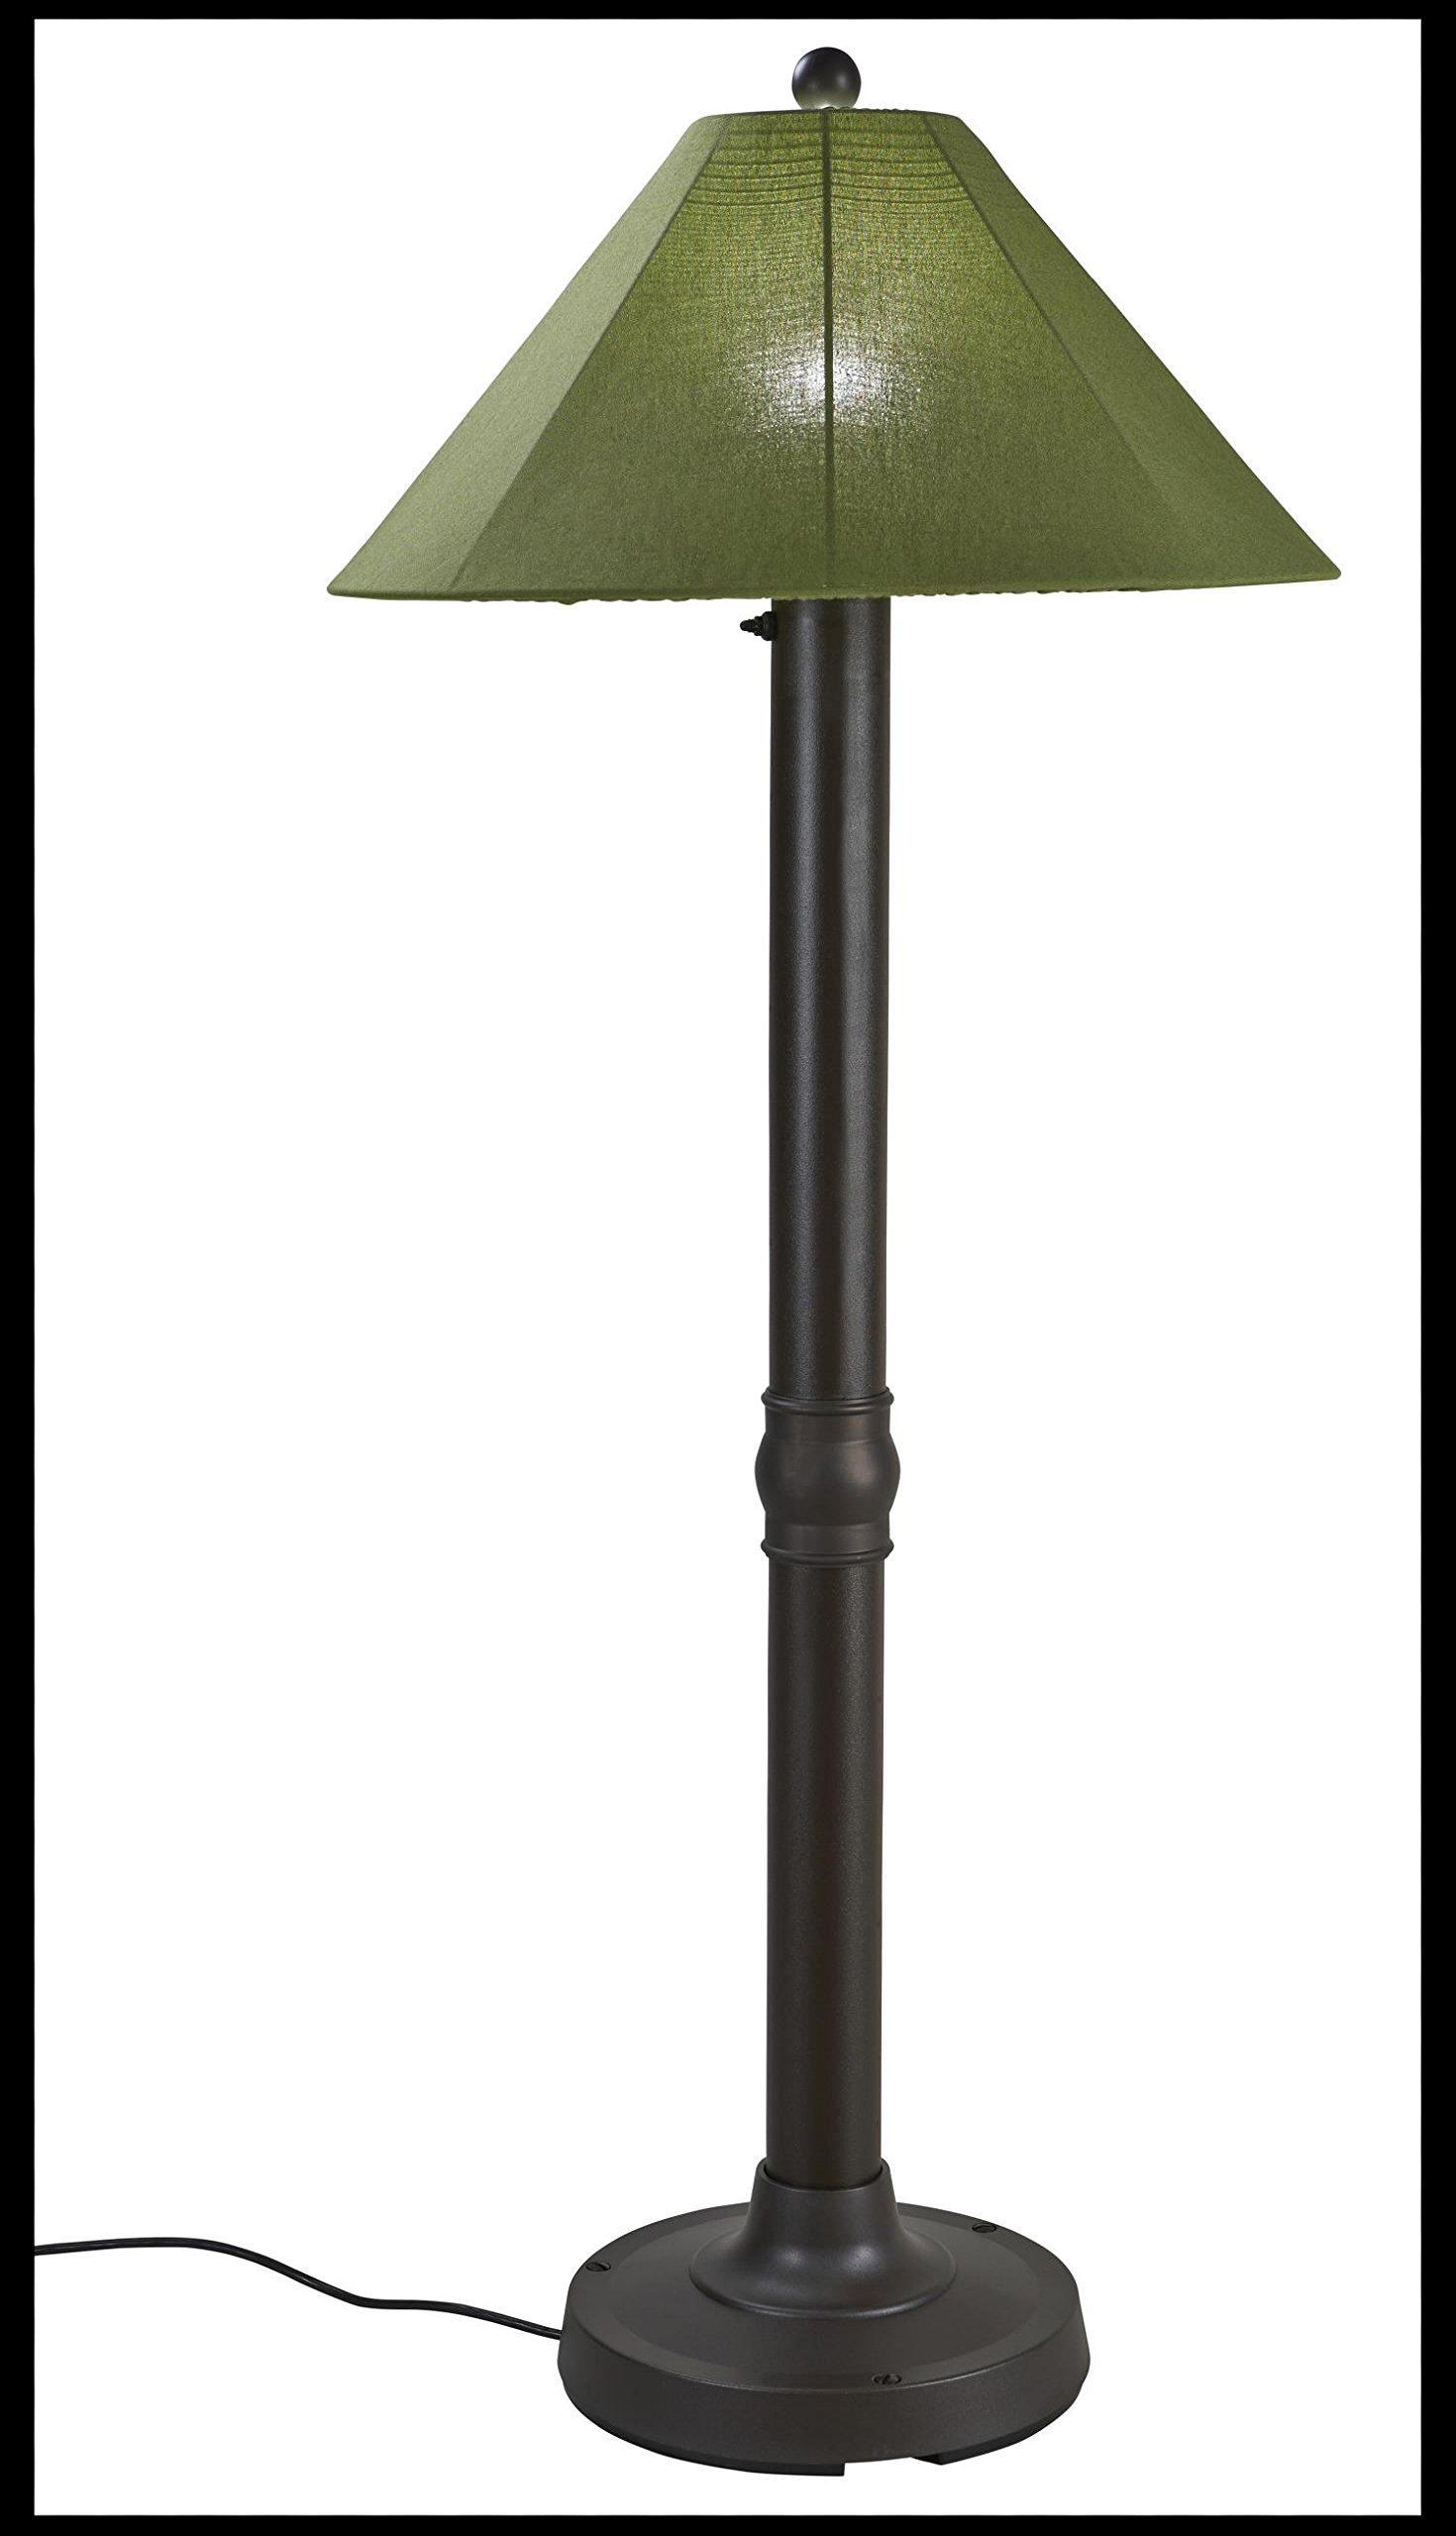 Patio Living Concepts 65687 Catalina Outdoor Floor Lamp